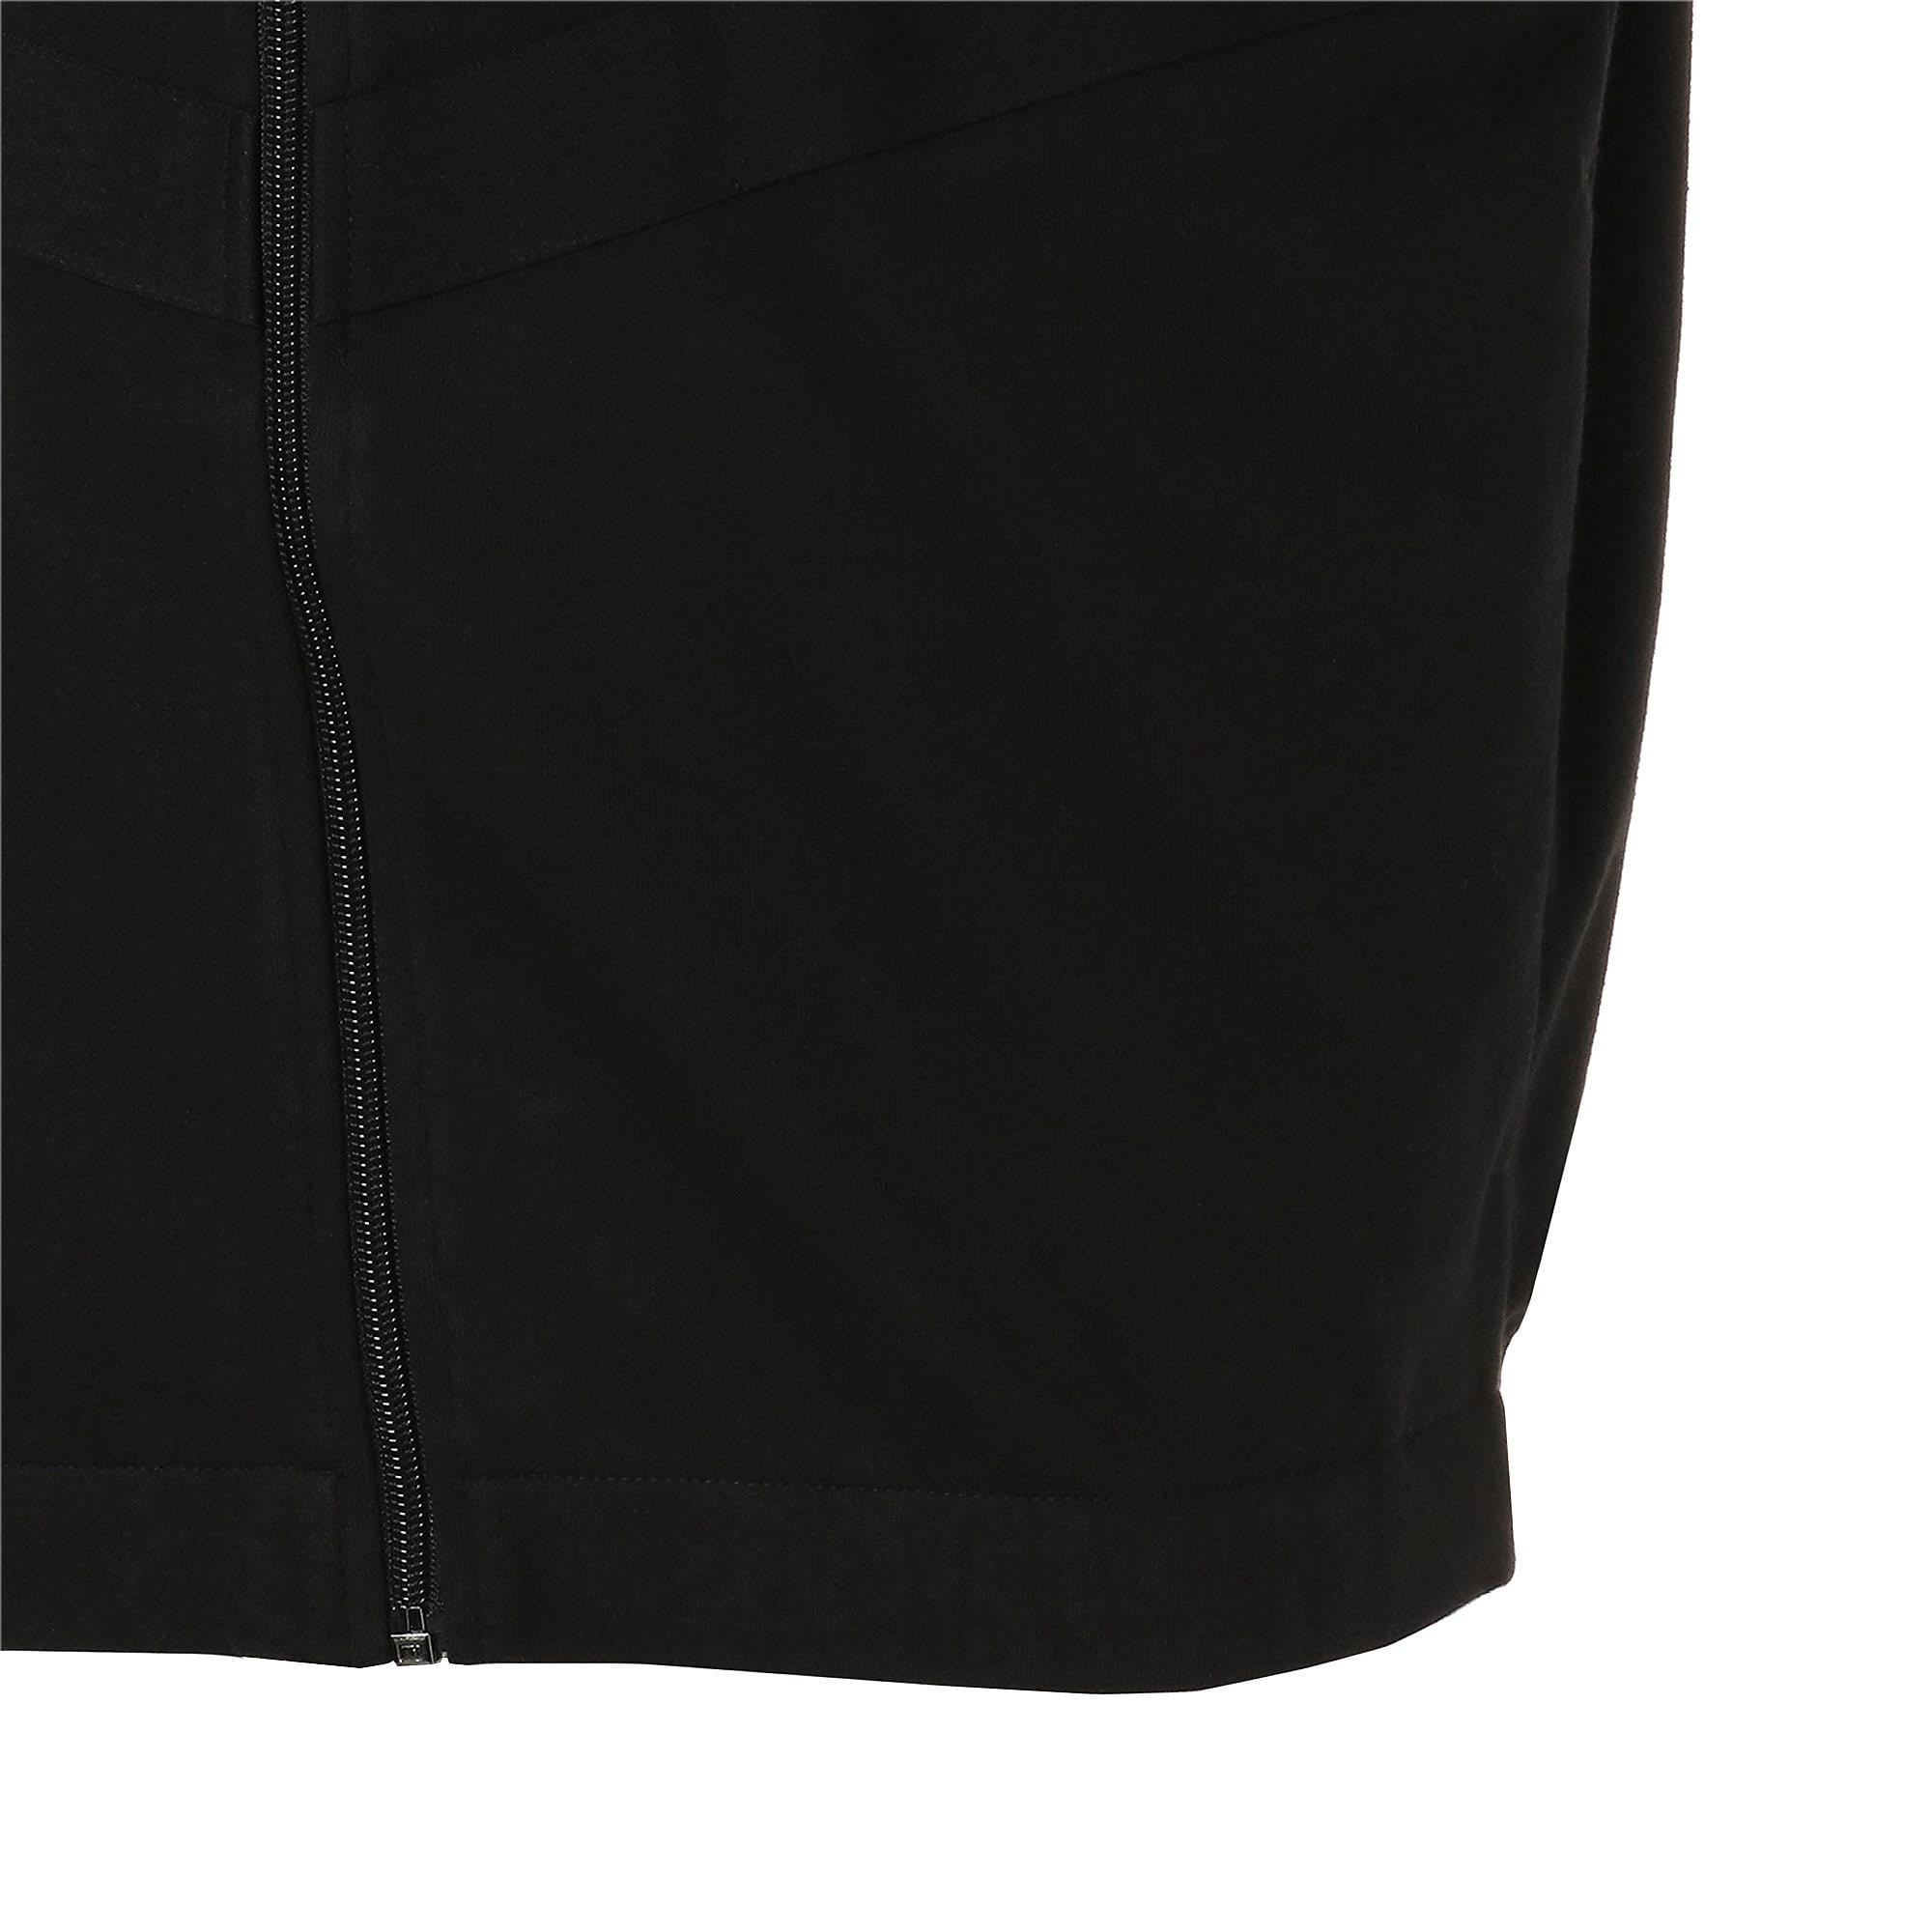 Thumbnail 9 of フィール イット ウィメンズ トレーニング スウェットジャケット, Puma Black, medium-JPN